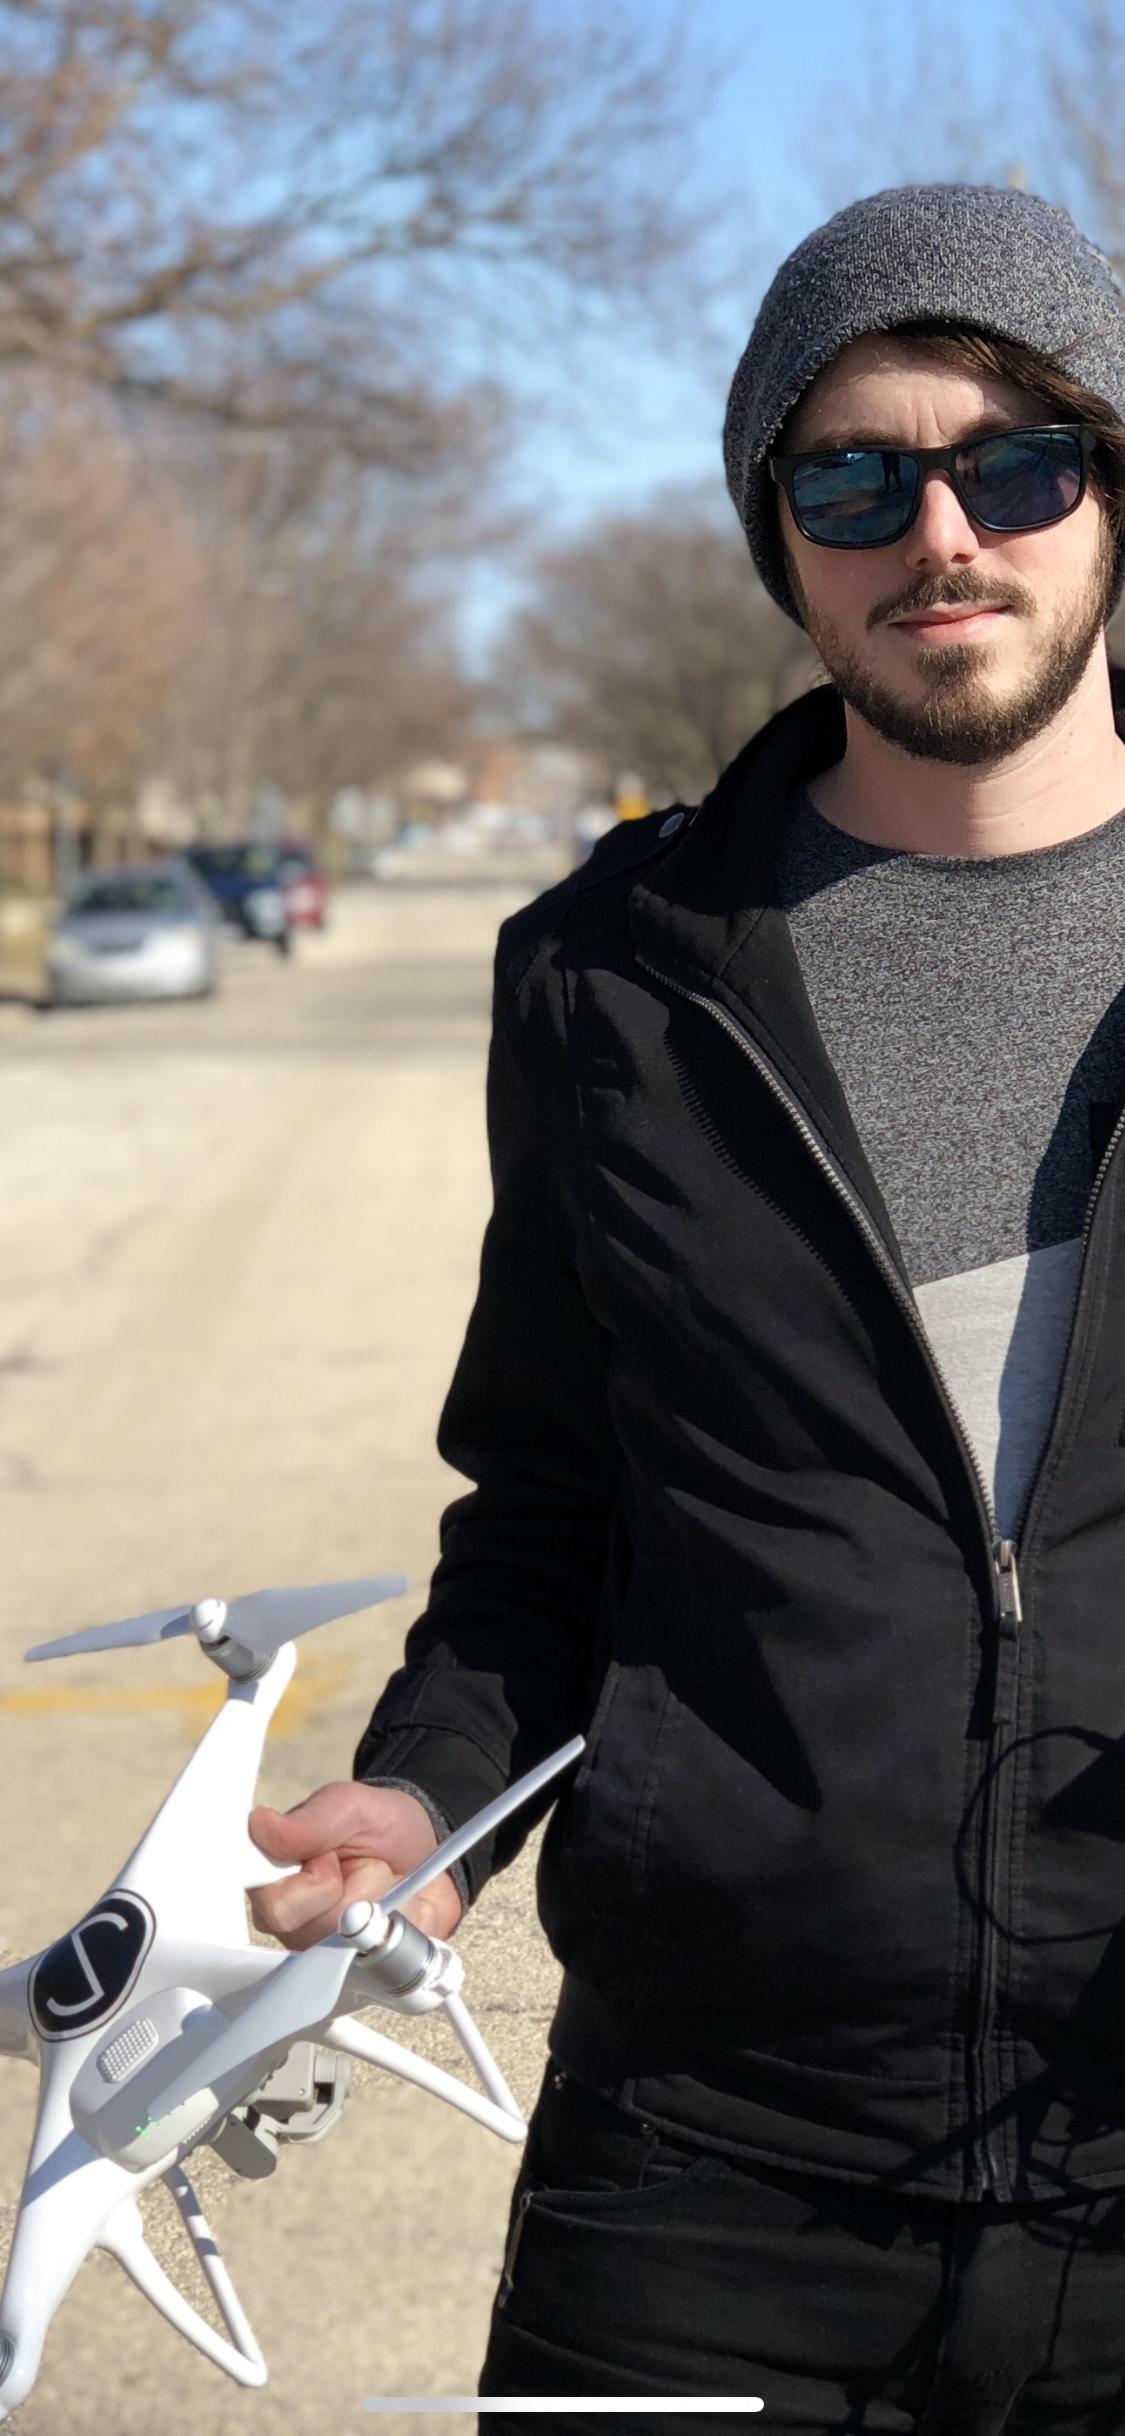 chicago_drone_photographer